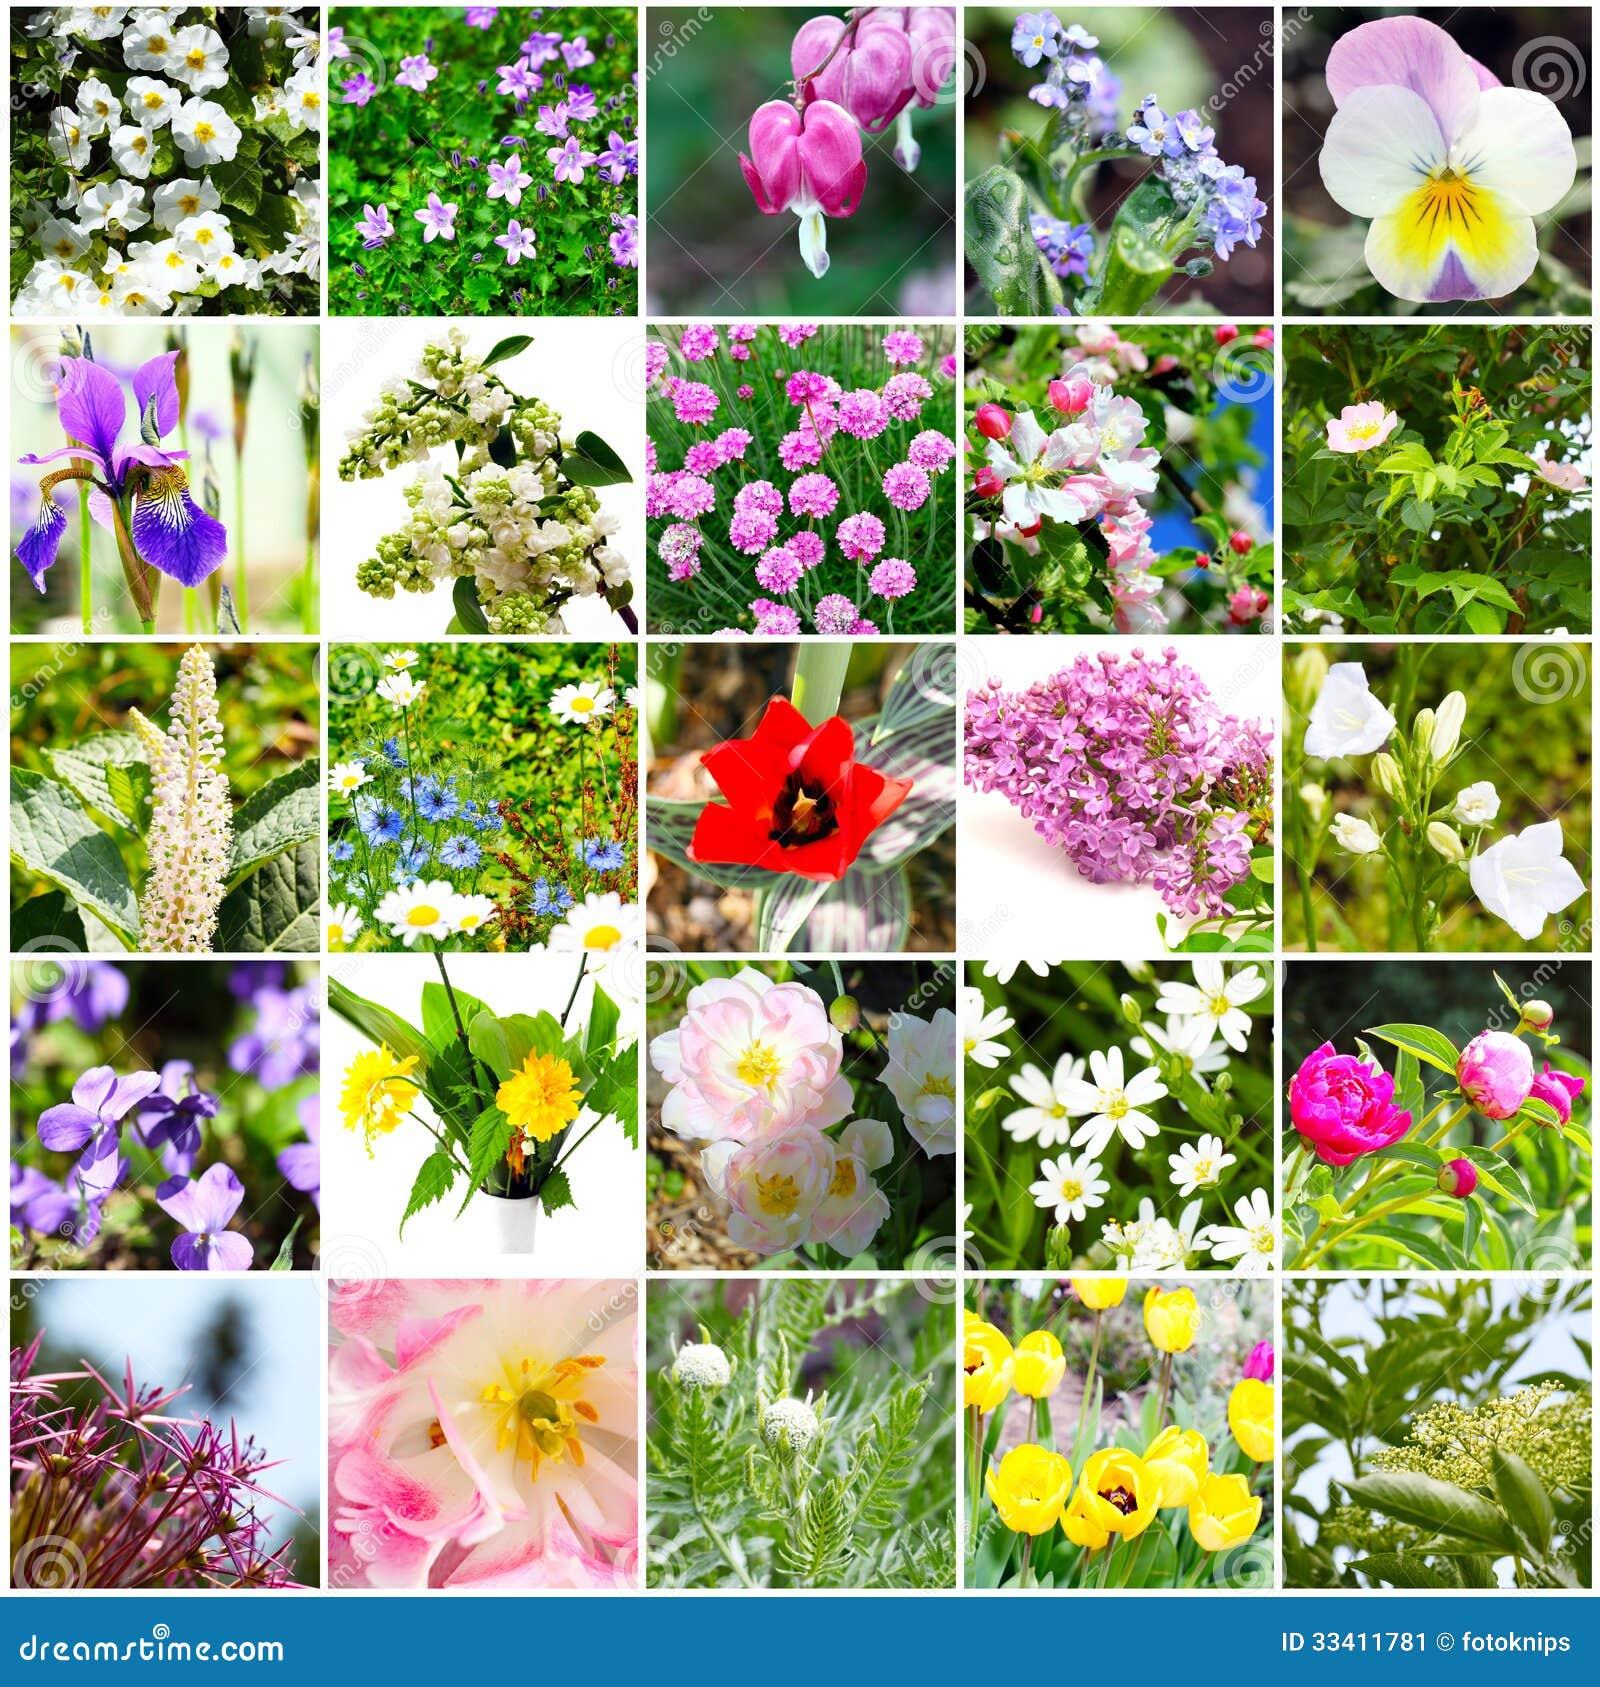 vari t de fleur mosa que de fleurs image stock image 33411781. Black Bedroom Furniture Sets. Home Design Ideas